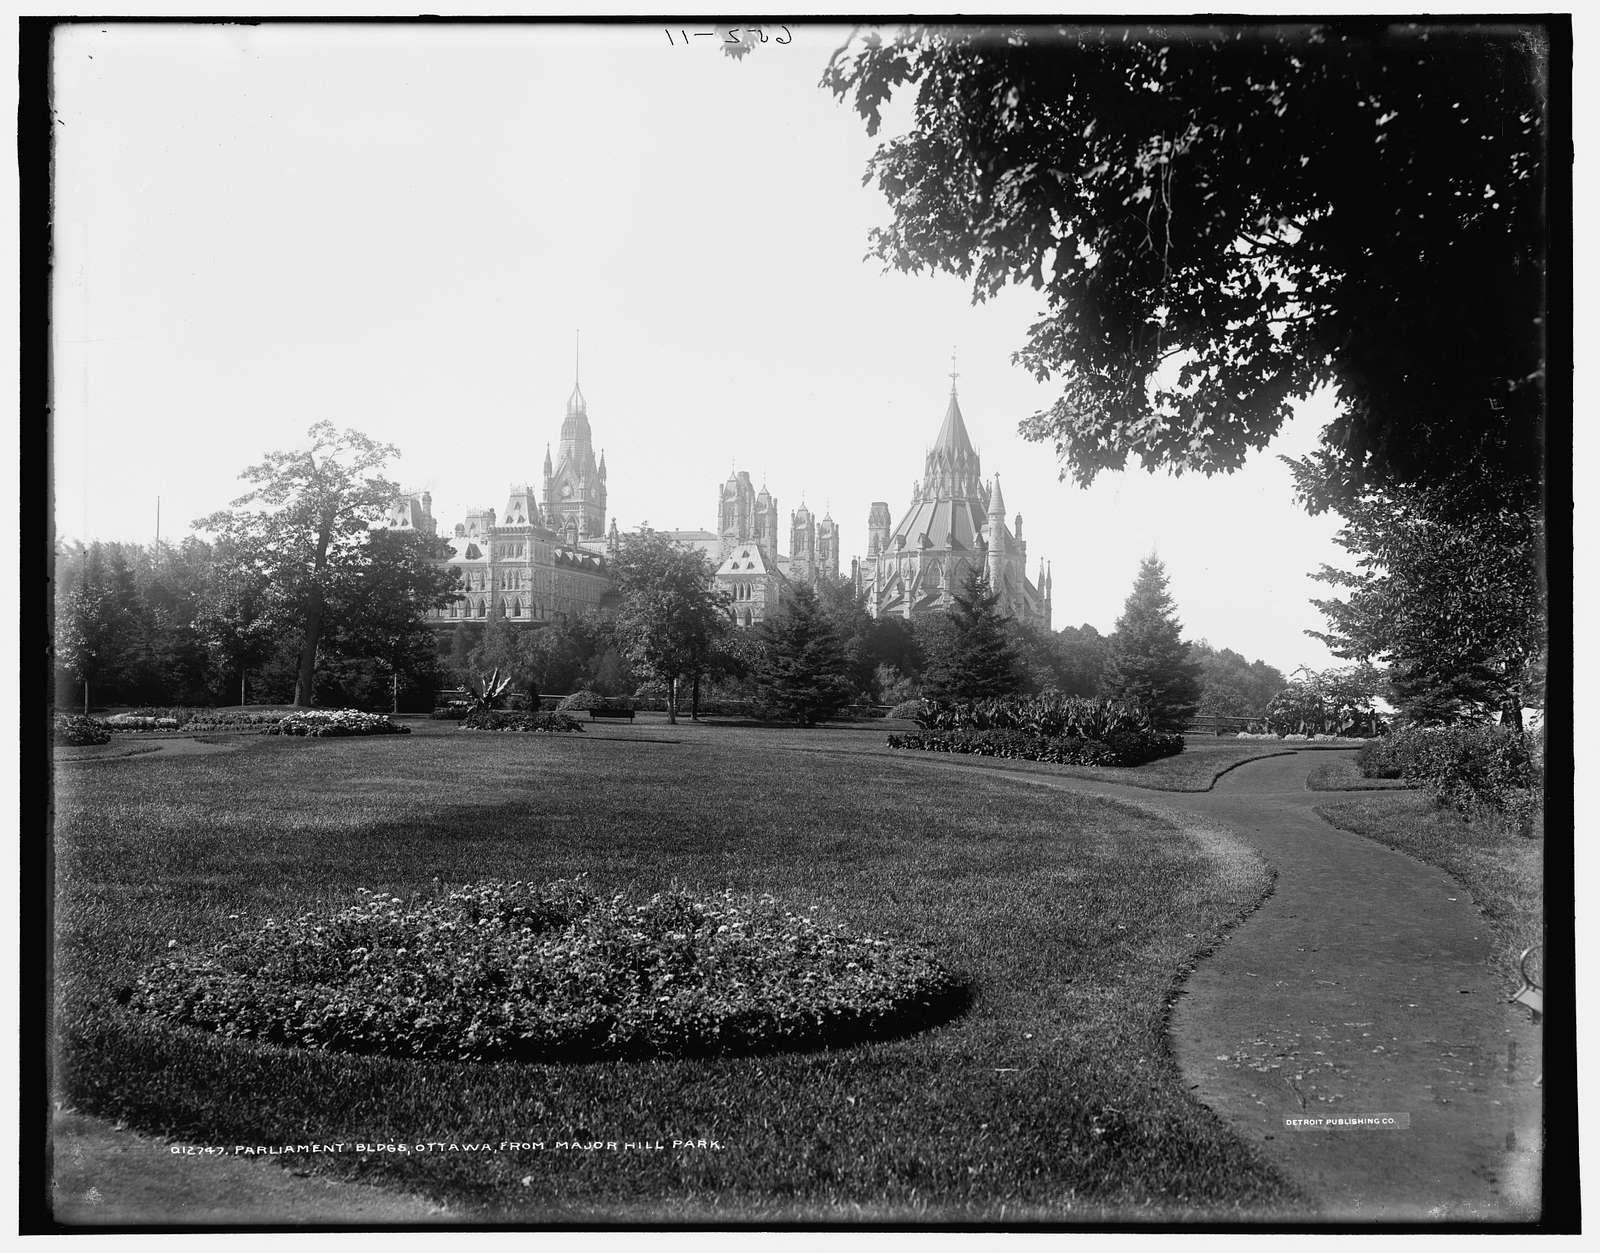 Parliament bldgs., from Major i.e. Major's Hill Park, Ottawa